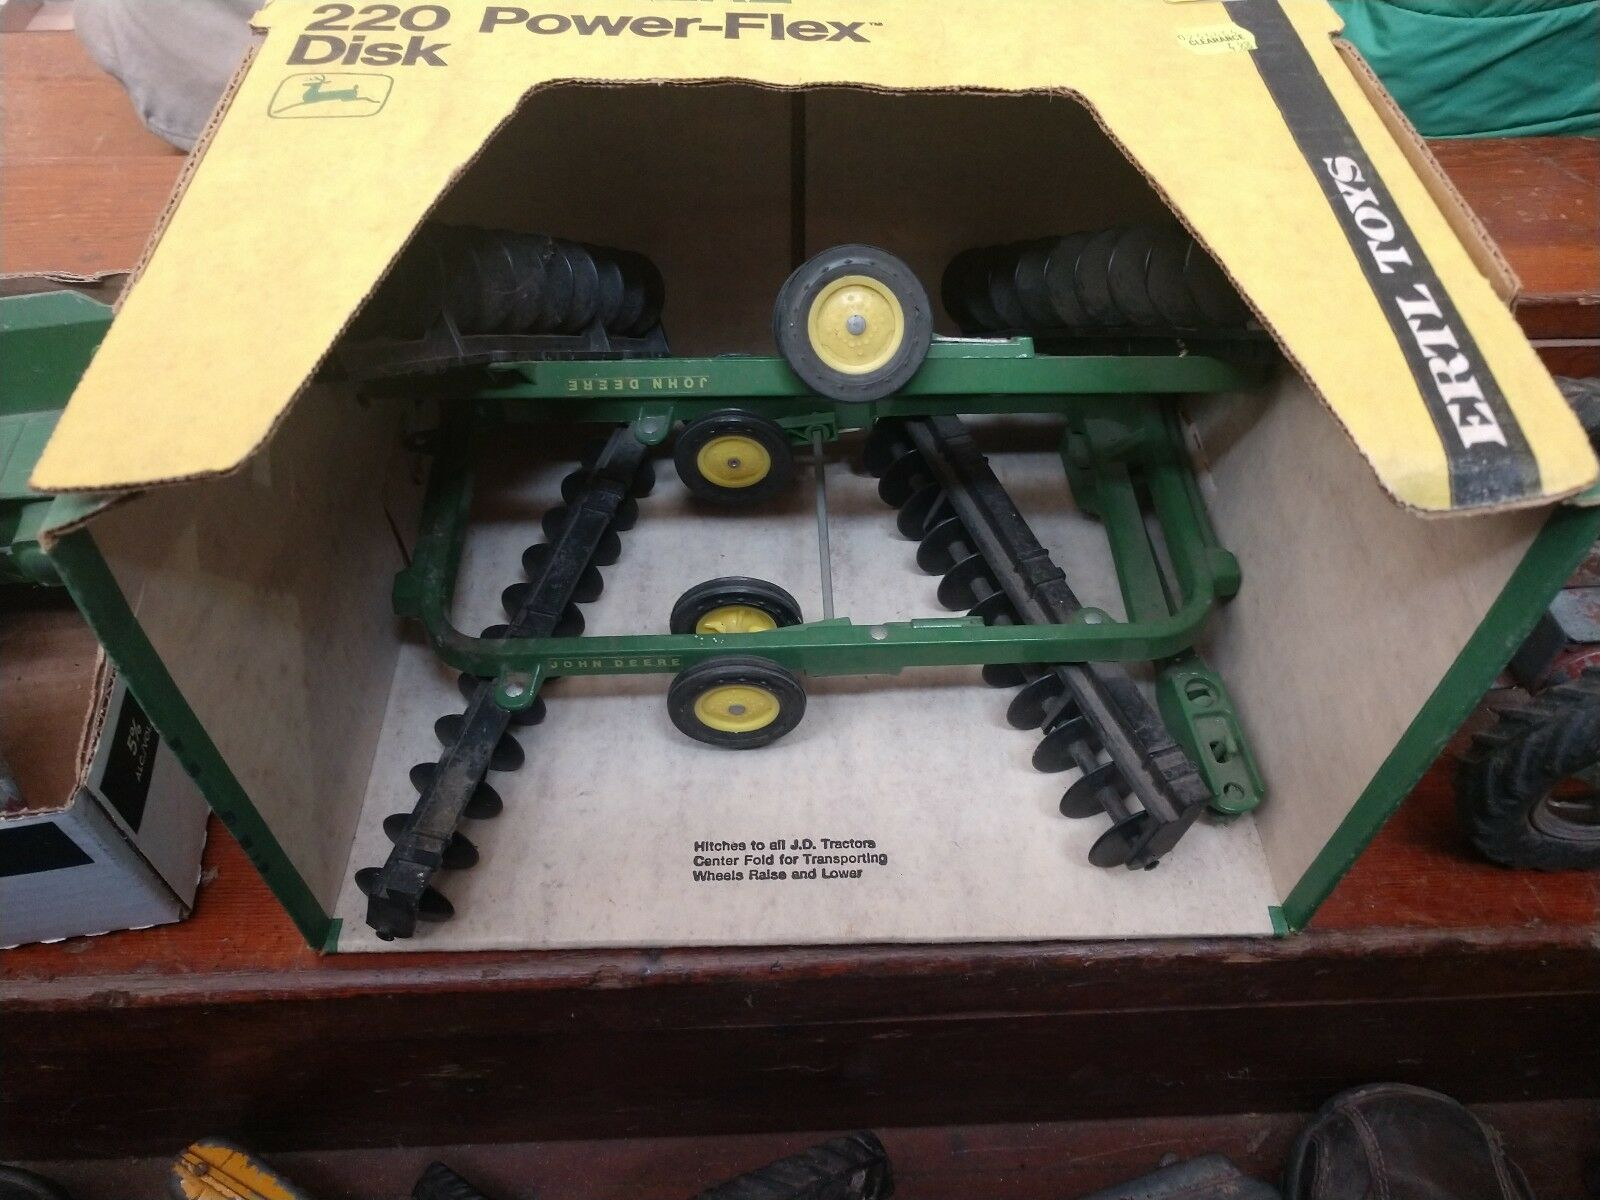 JOHN DEERE 220 POWER-FLEX FOLDING DISK in BOX ERTL ESKA Vintage Farm Toy JD DISC